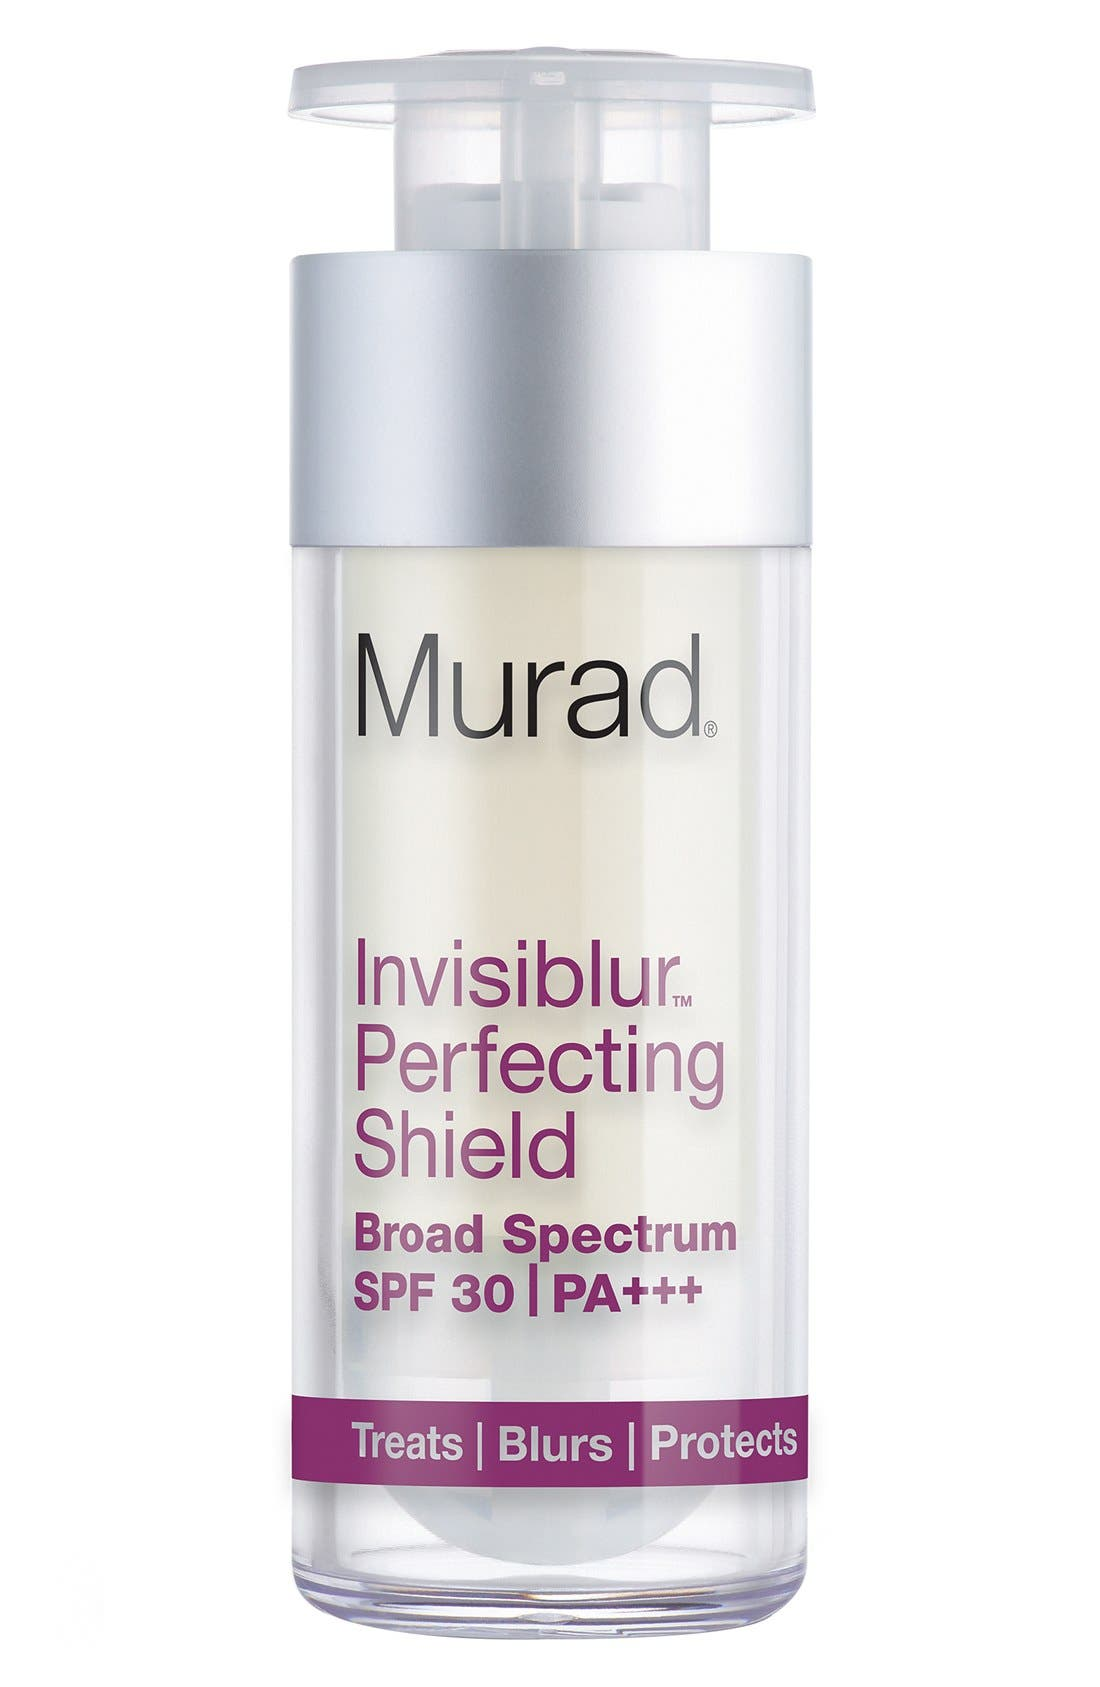 'Invisiblur<sup>™</sup>' Perfecting Shield Broad Spectrum SPF 30 PA+++,                             Main thumbnail 1, color,                             NO COLOR